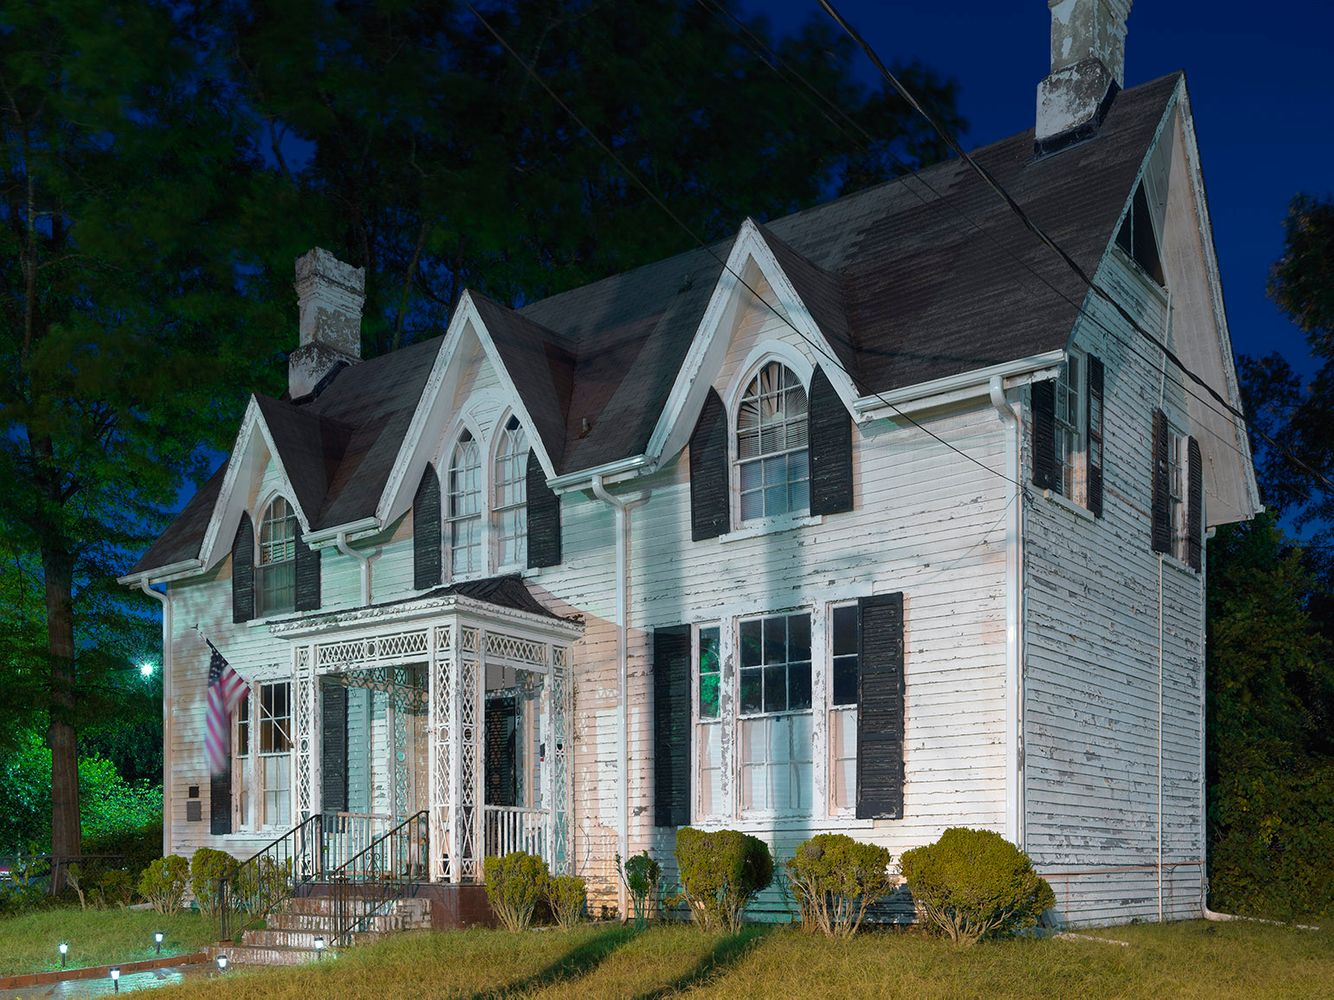 Moses Roundtree House C.1869, Wilson, NC 2018